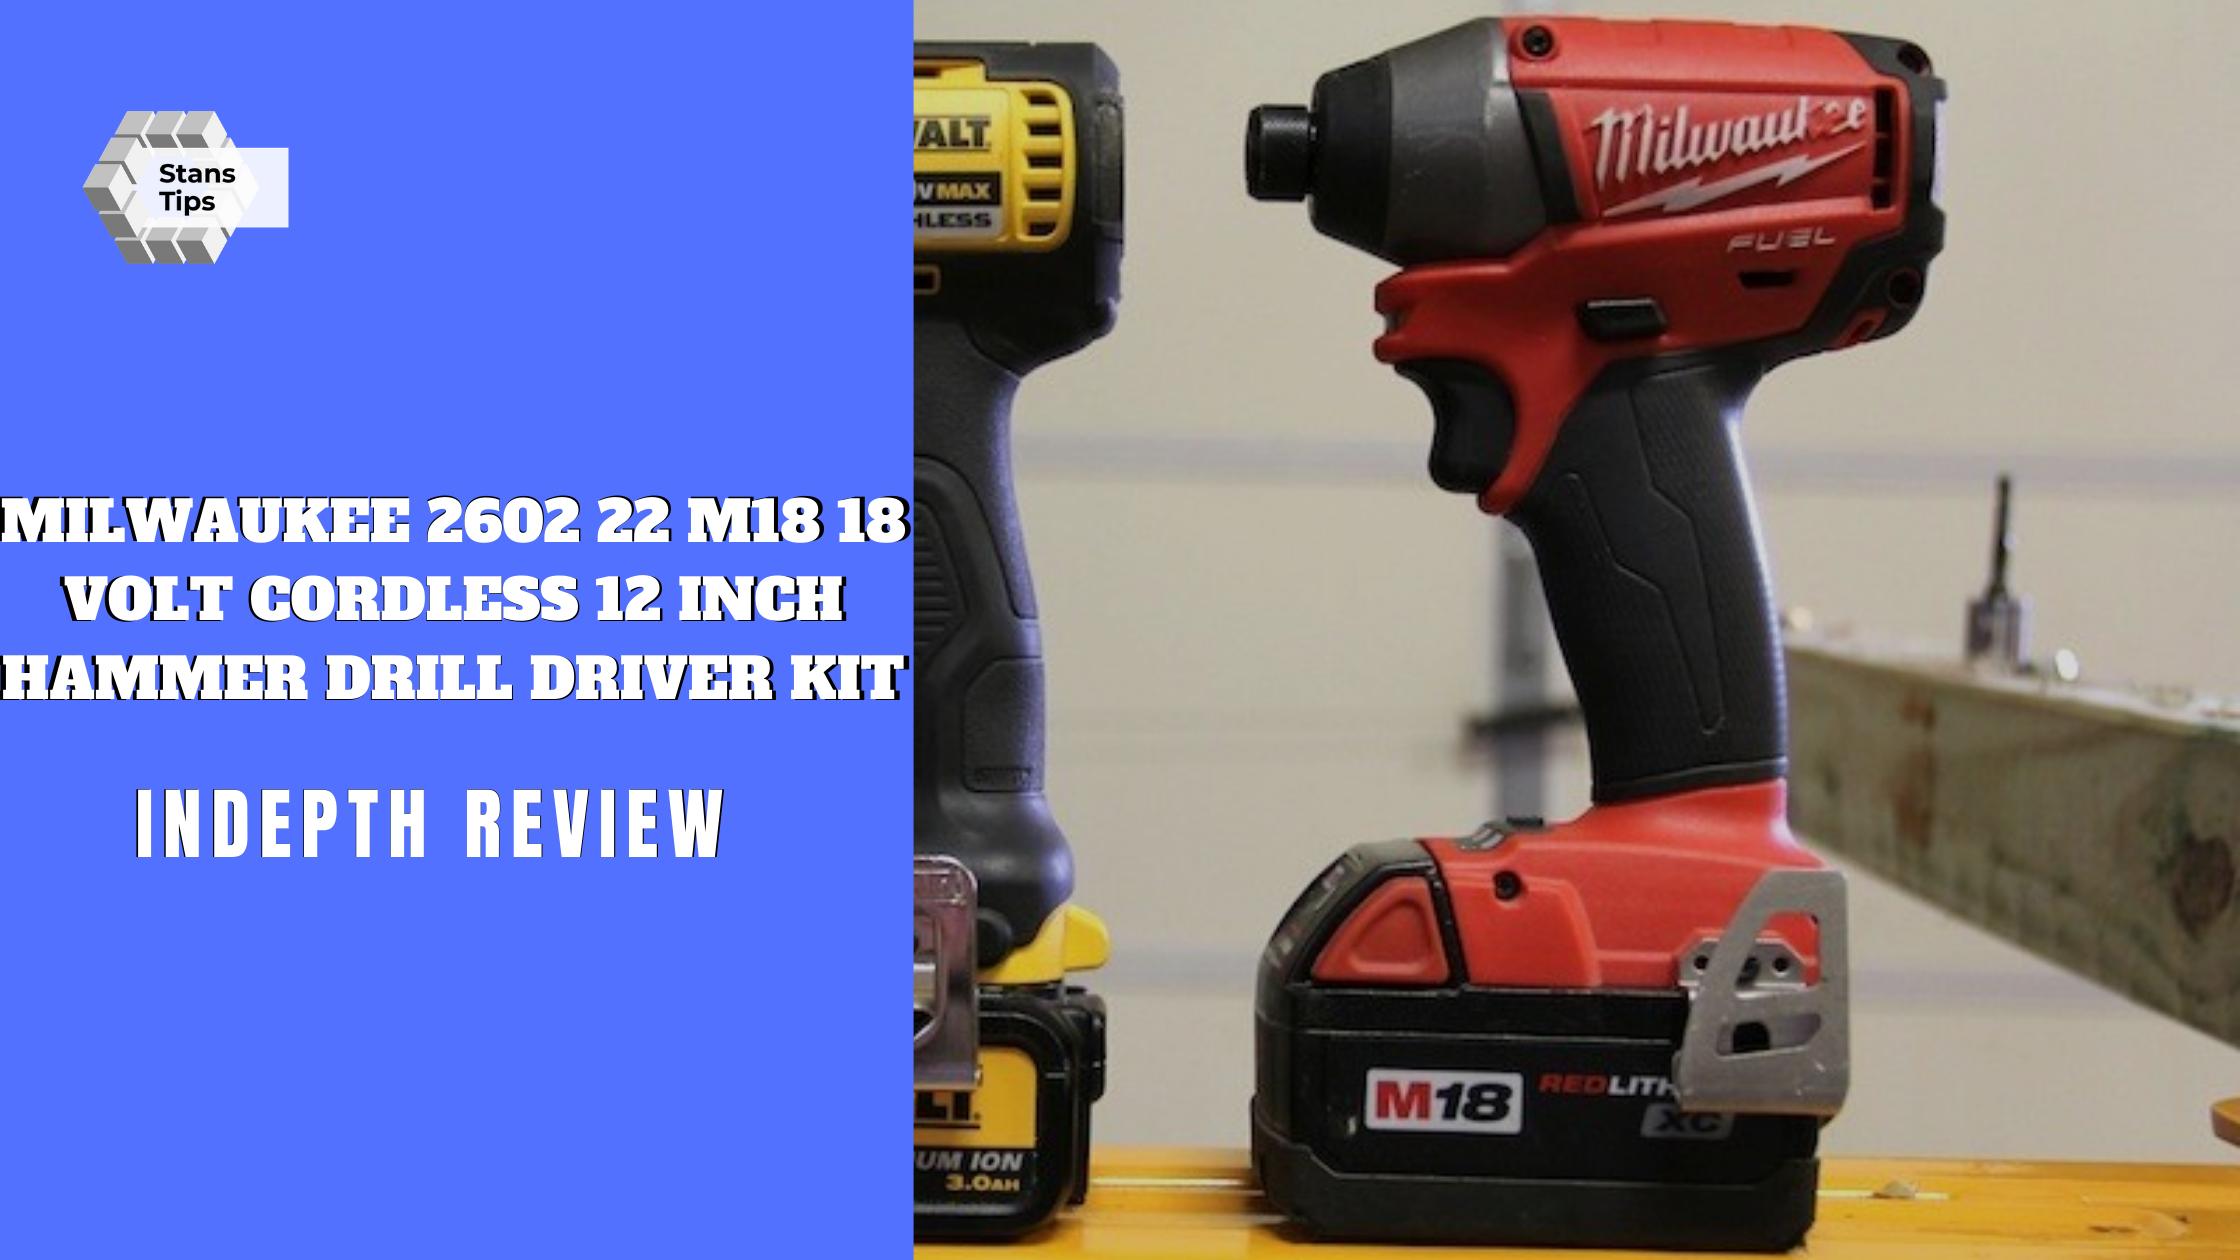 Milwaukee 2602 22 m18 18 volt cordless 12 inch hammer drill driver kit